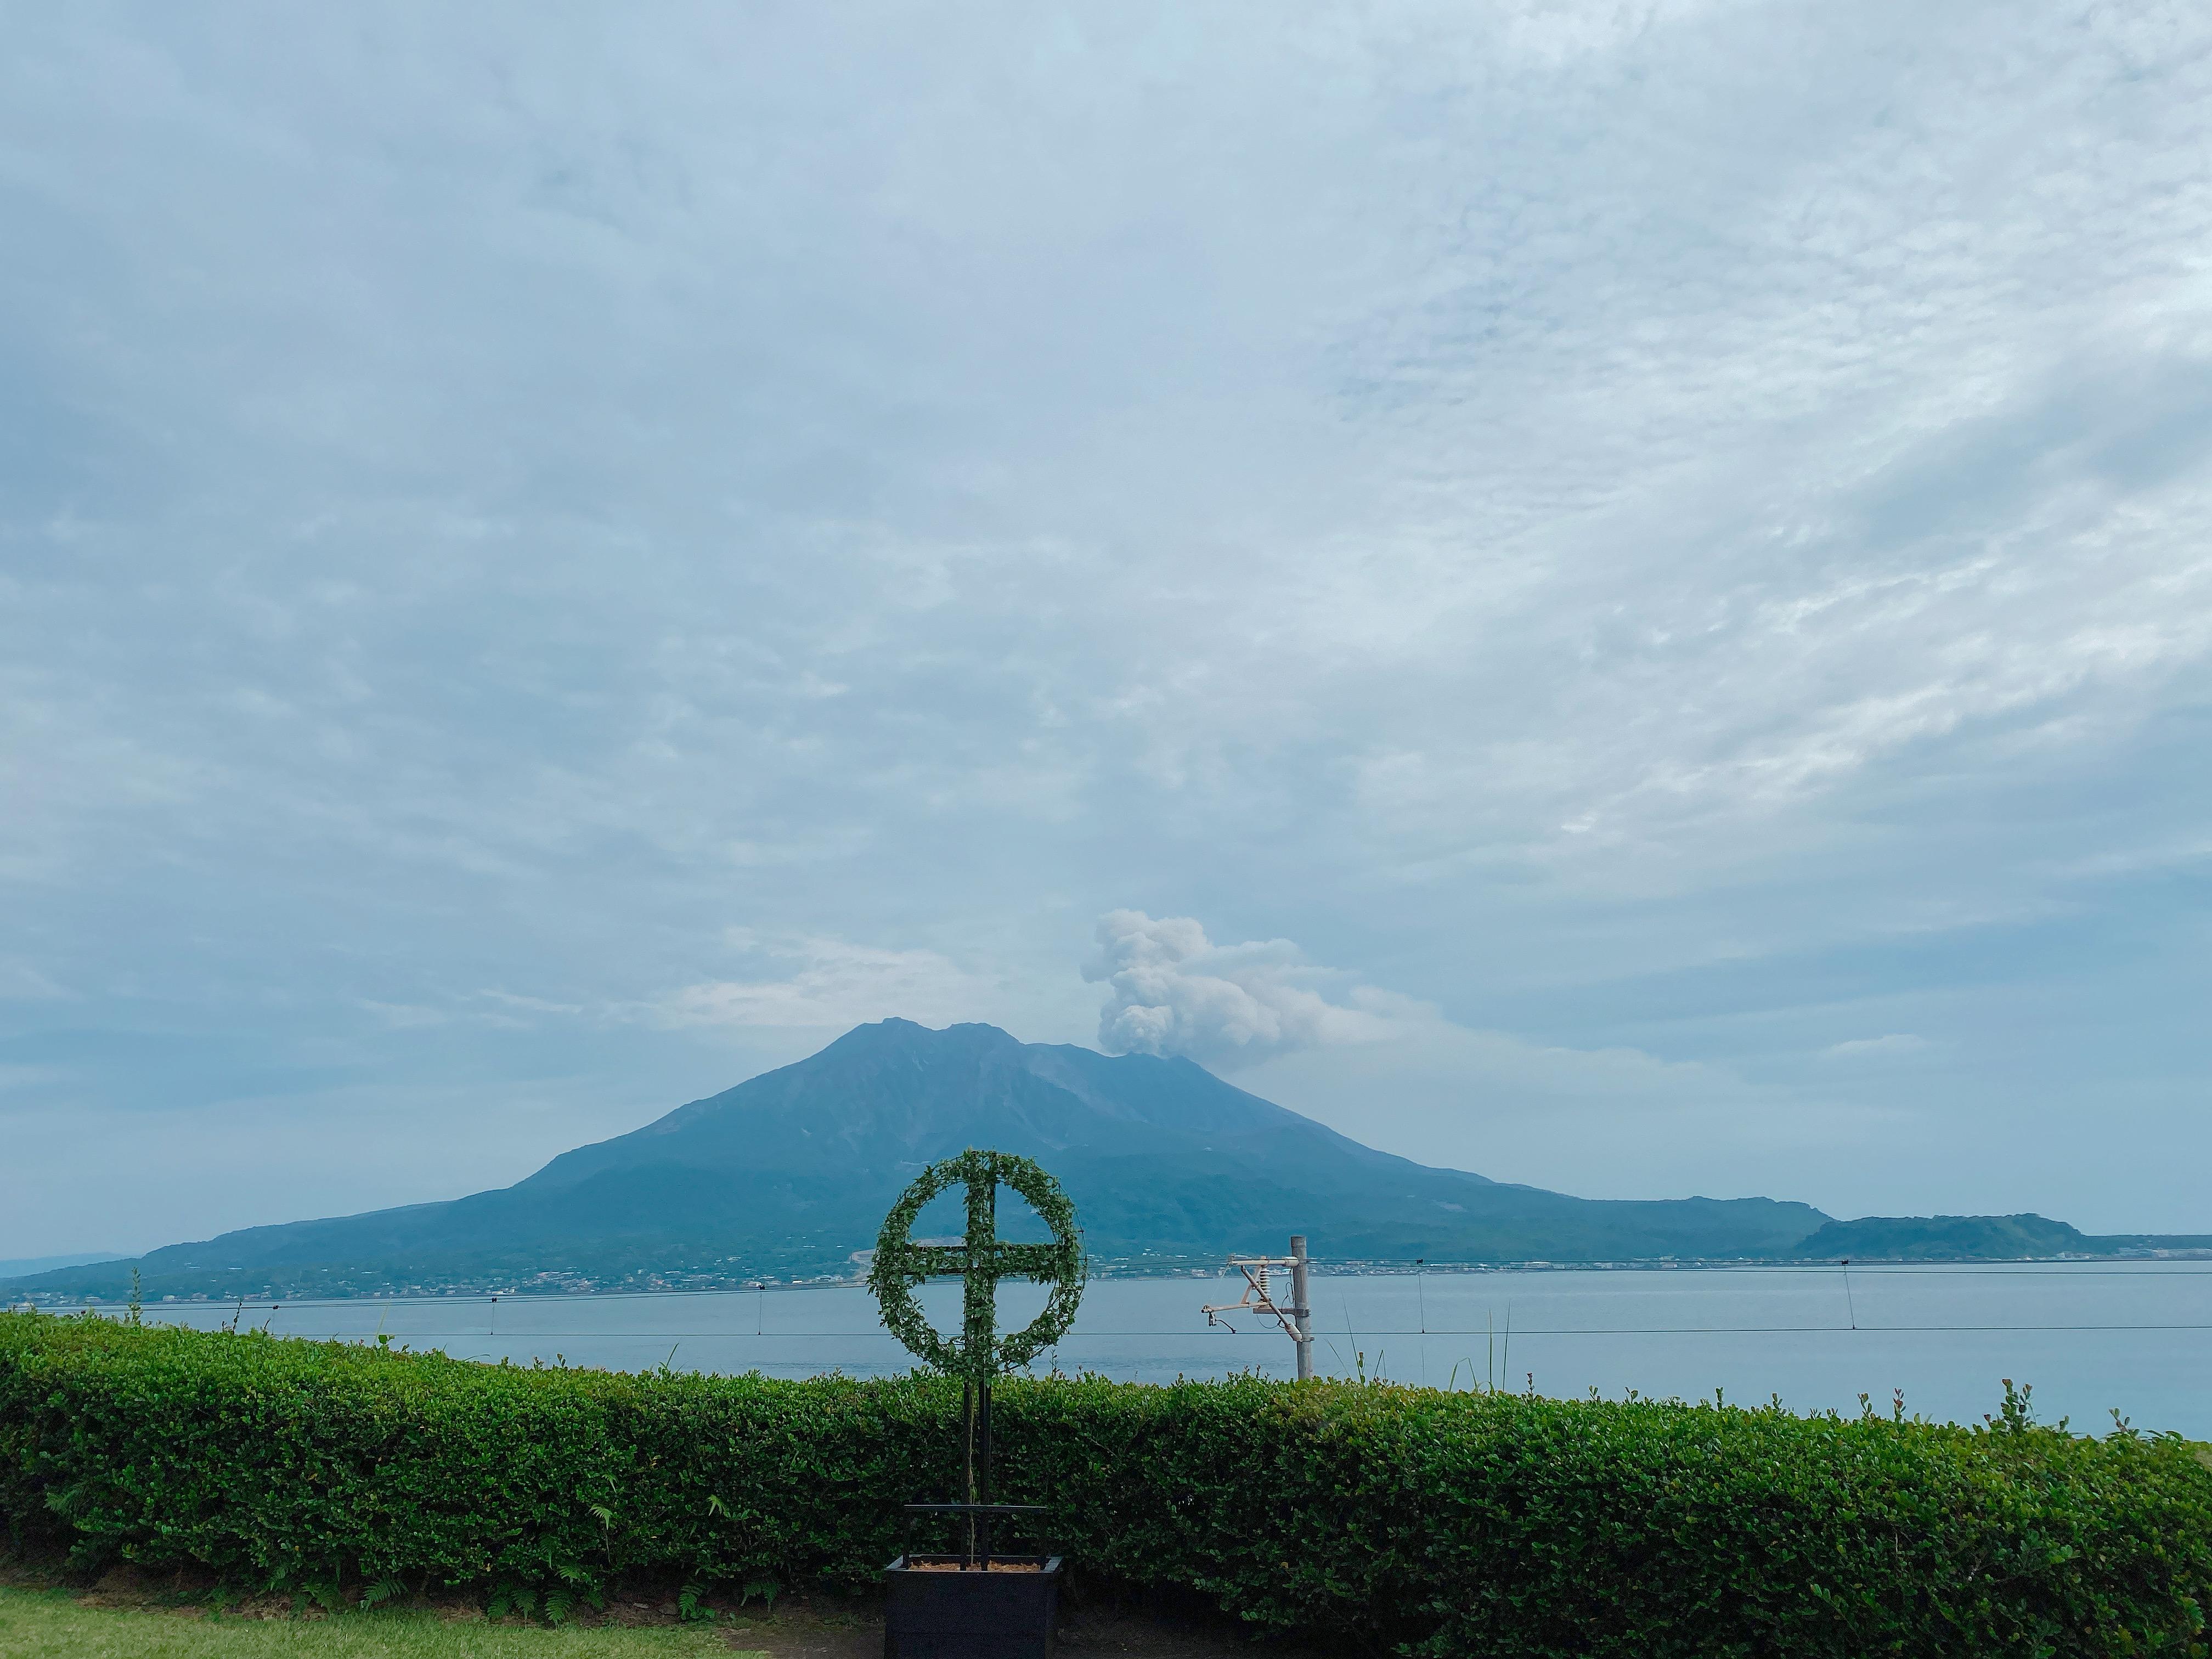 Great view of Sakura-jima